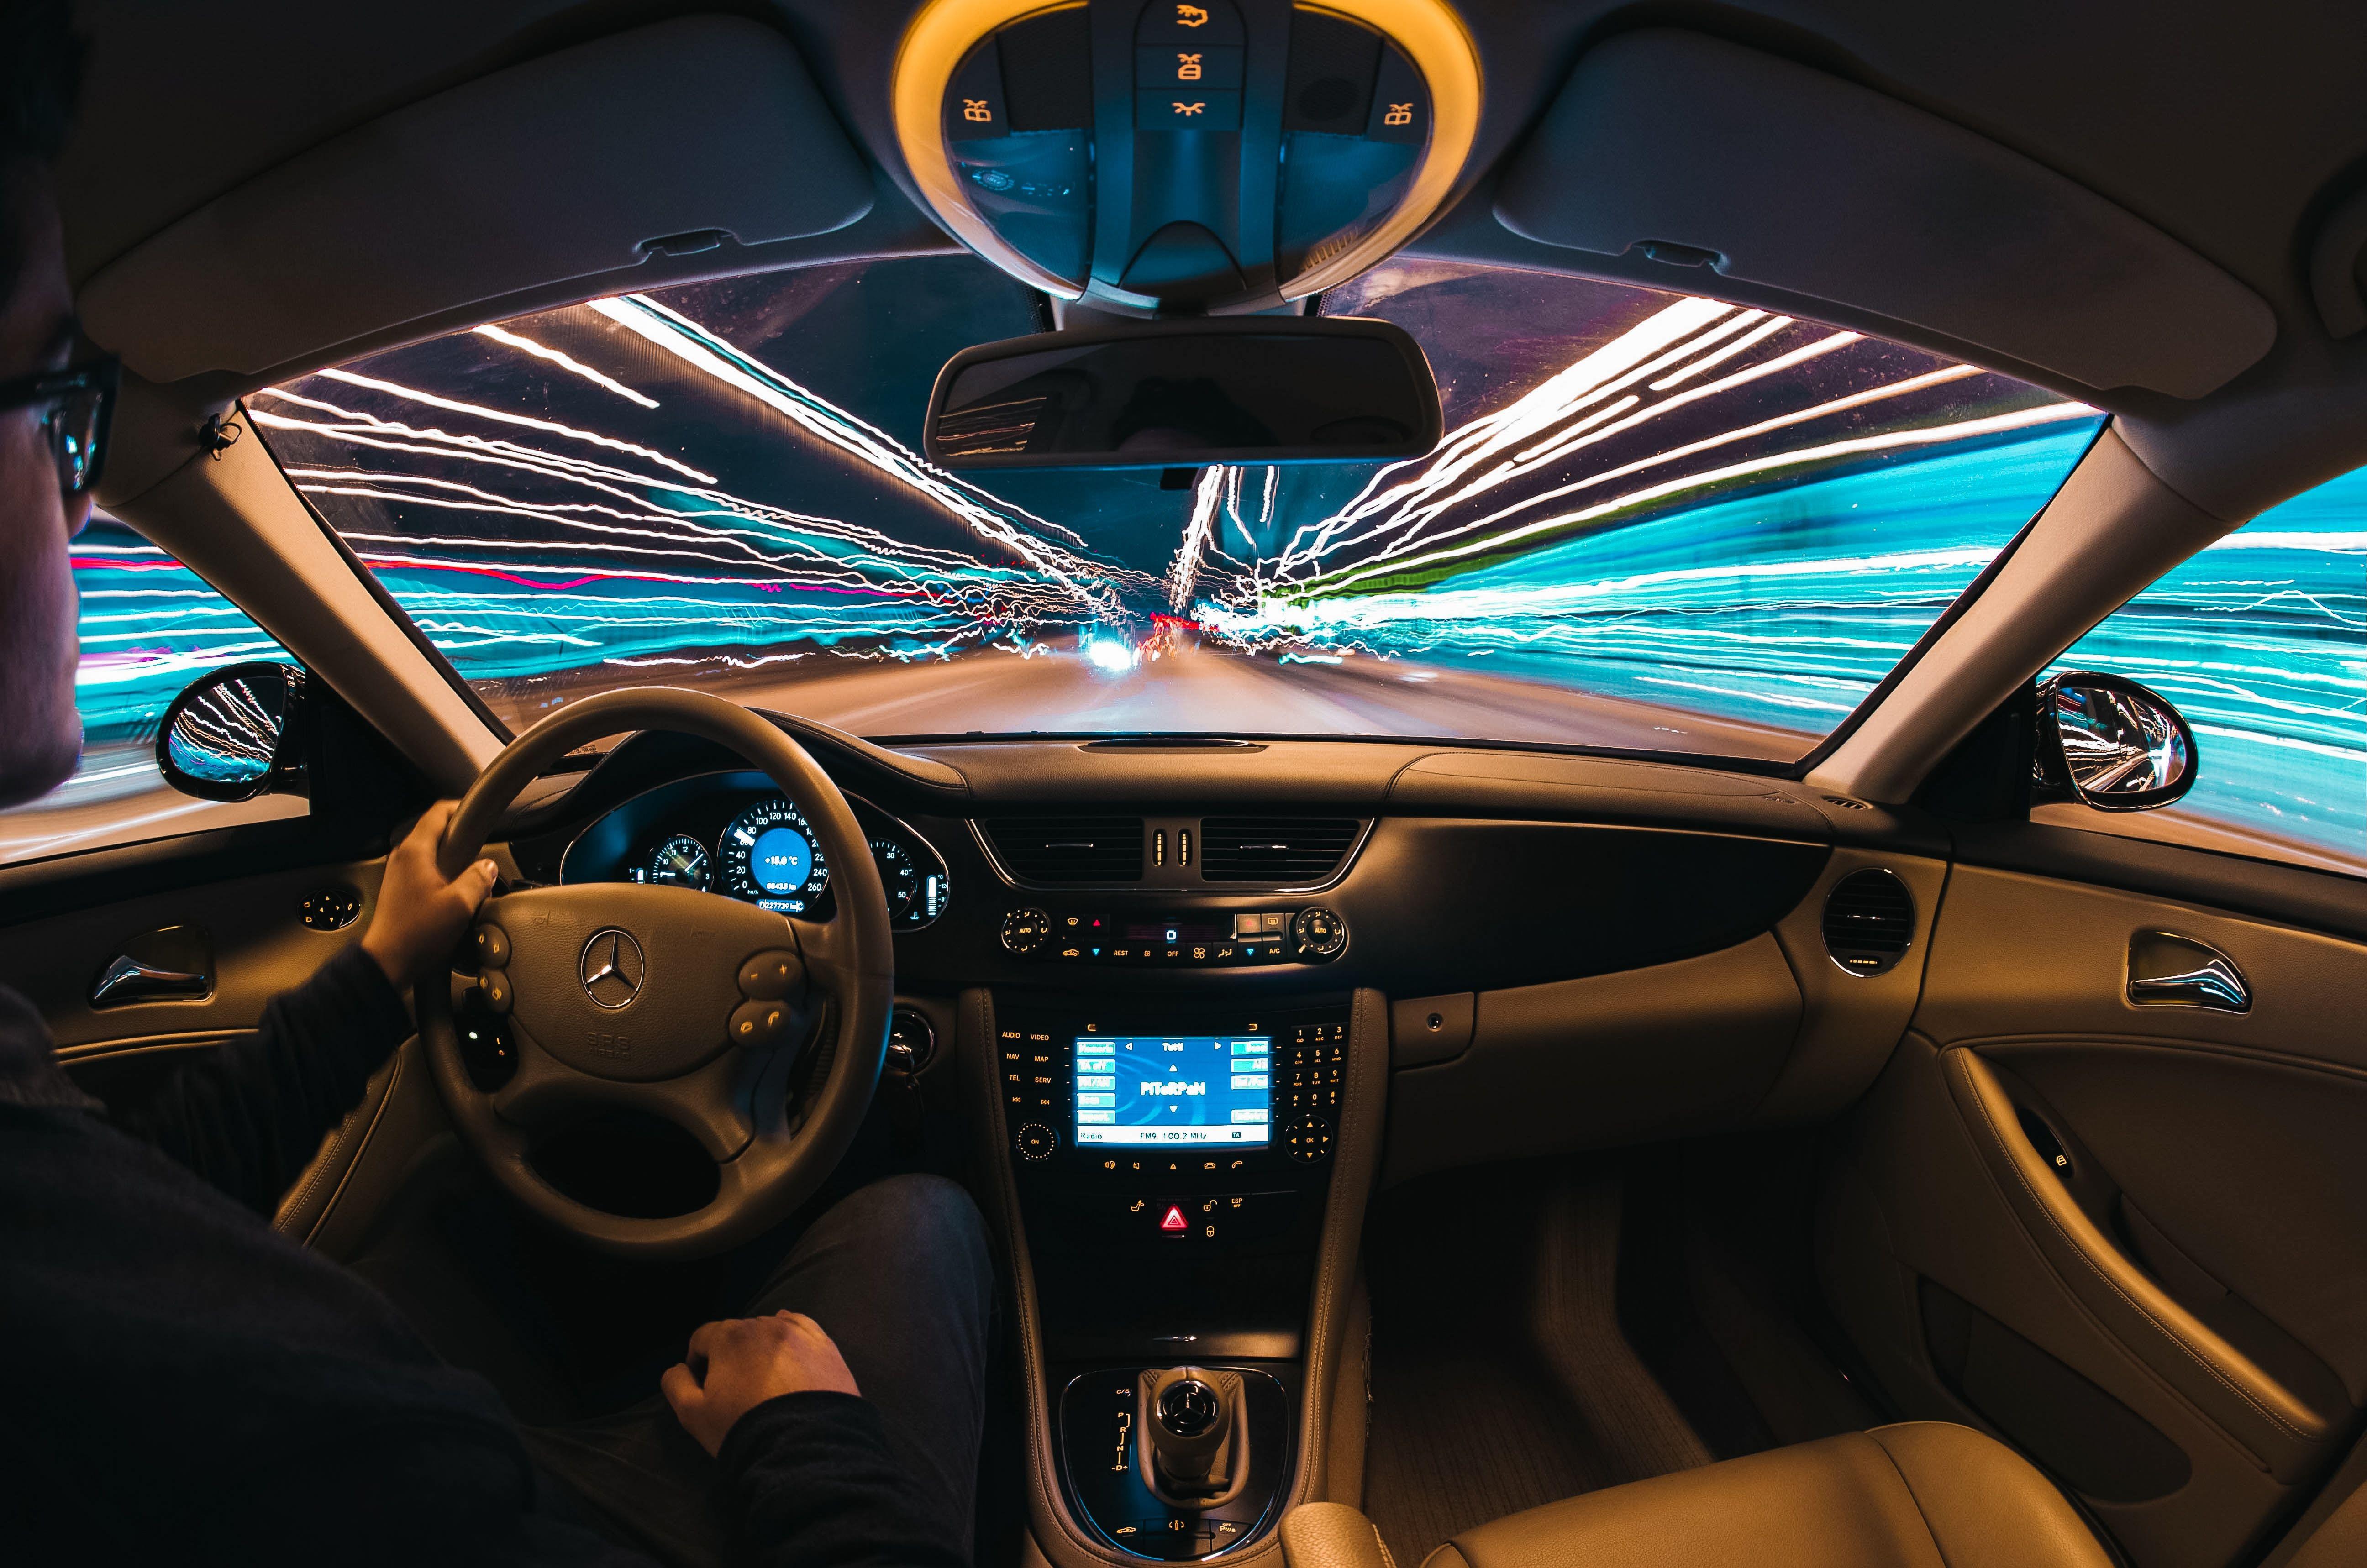 Self-Driving Cars Are the Next Innovation in IoT tech-wonders.com/?p=18352 | #IoT #InternetOfThings #SelfDrivingCars #SmartCars #Transportation#AutonomousVehicles #ElectricCars  #EmergingTech #technology #tech